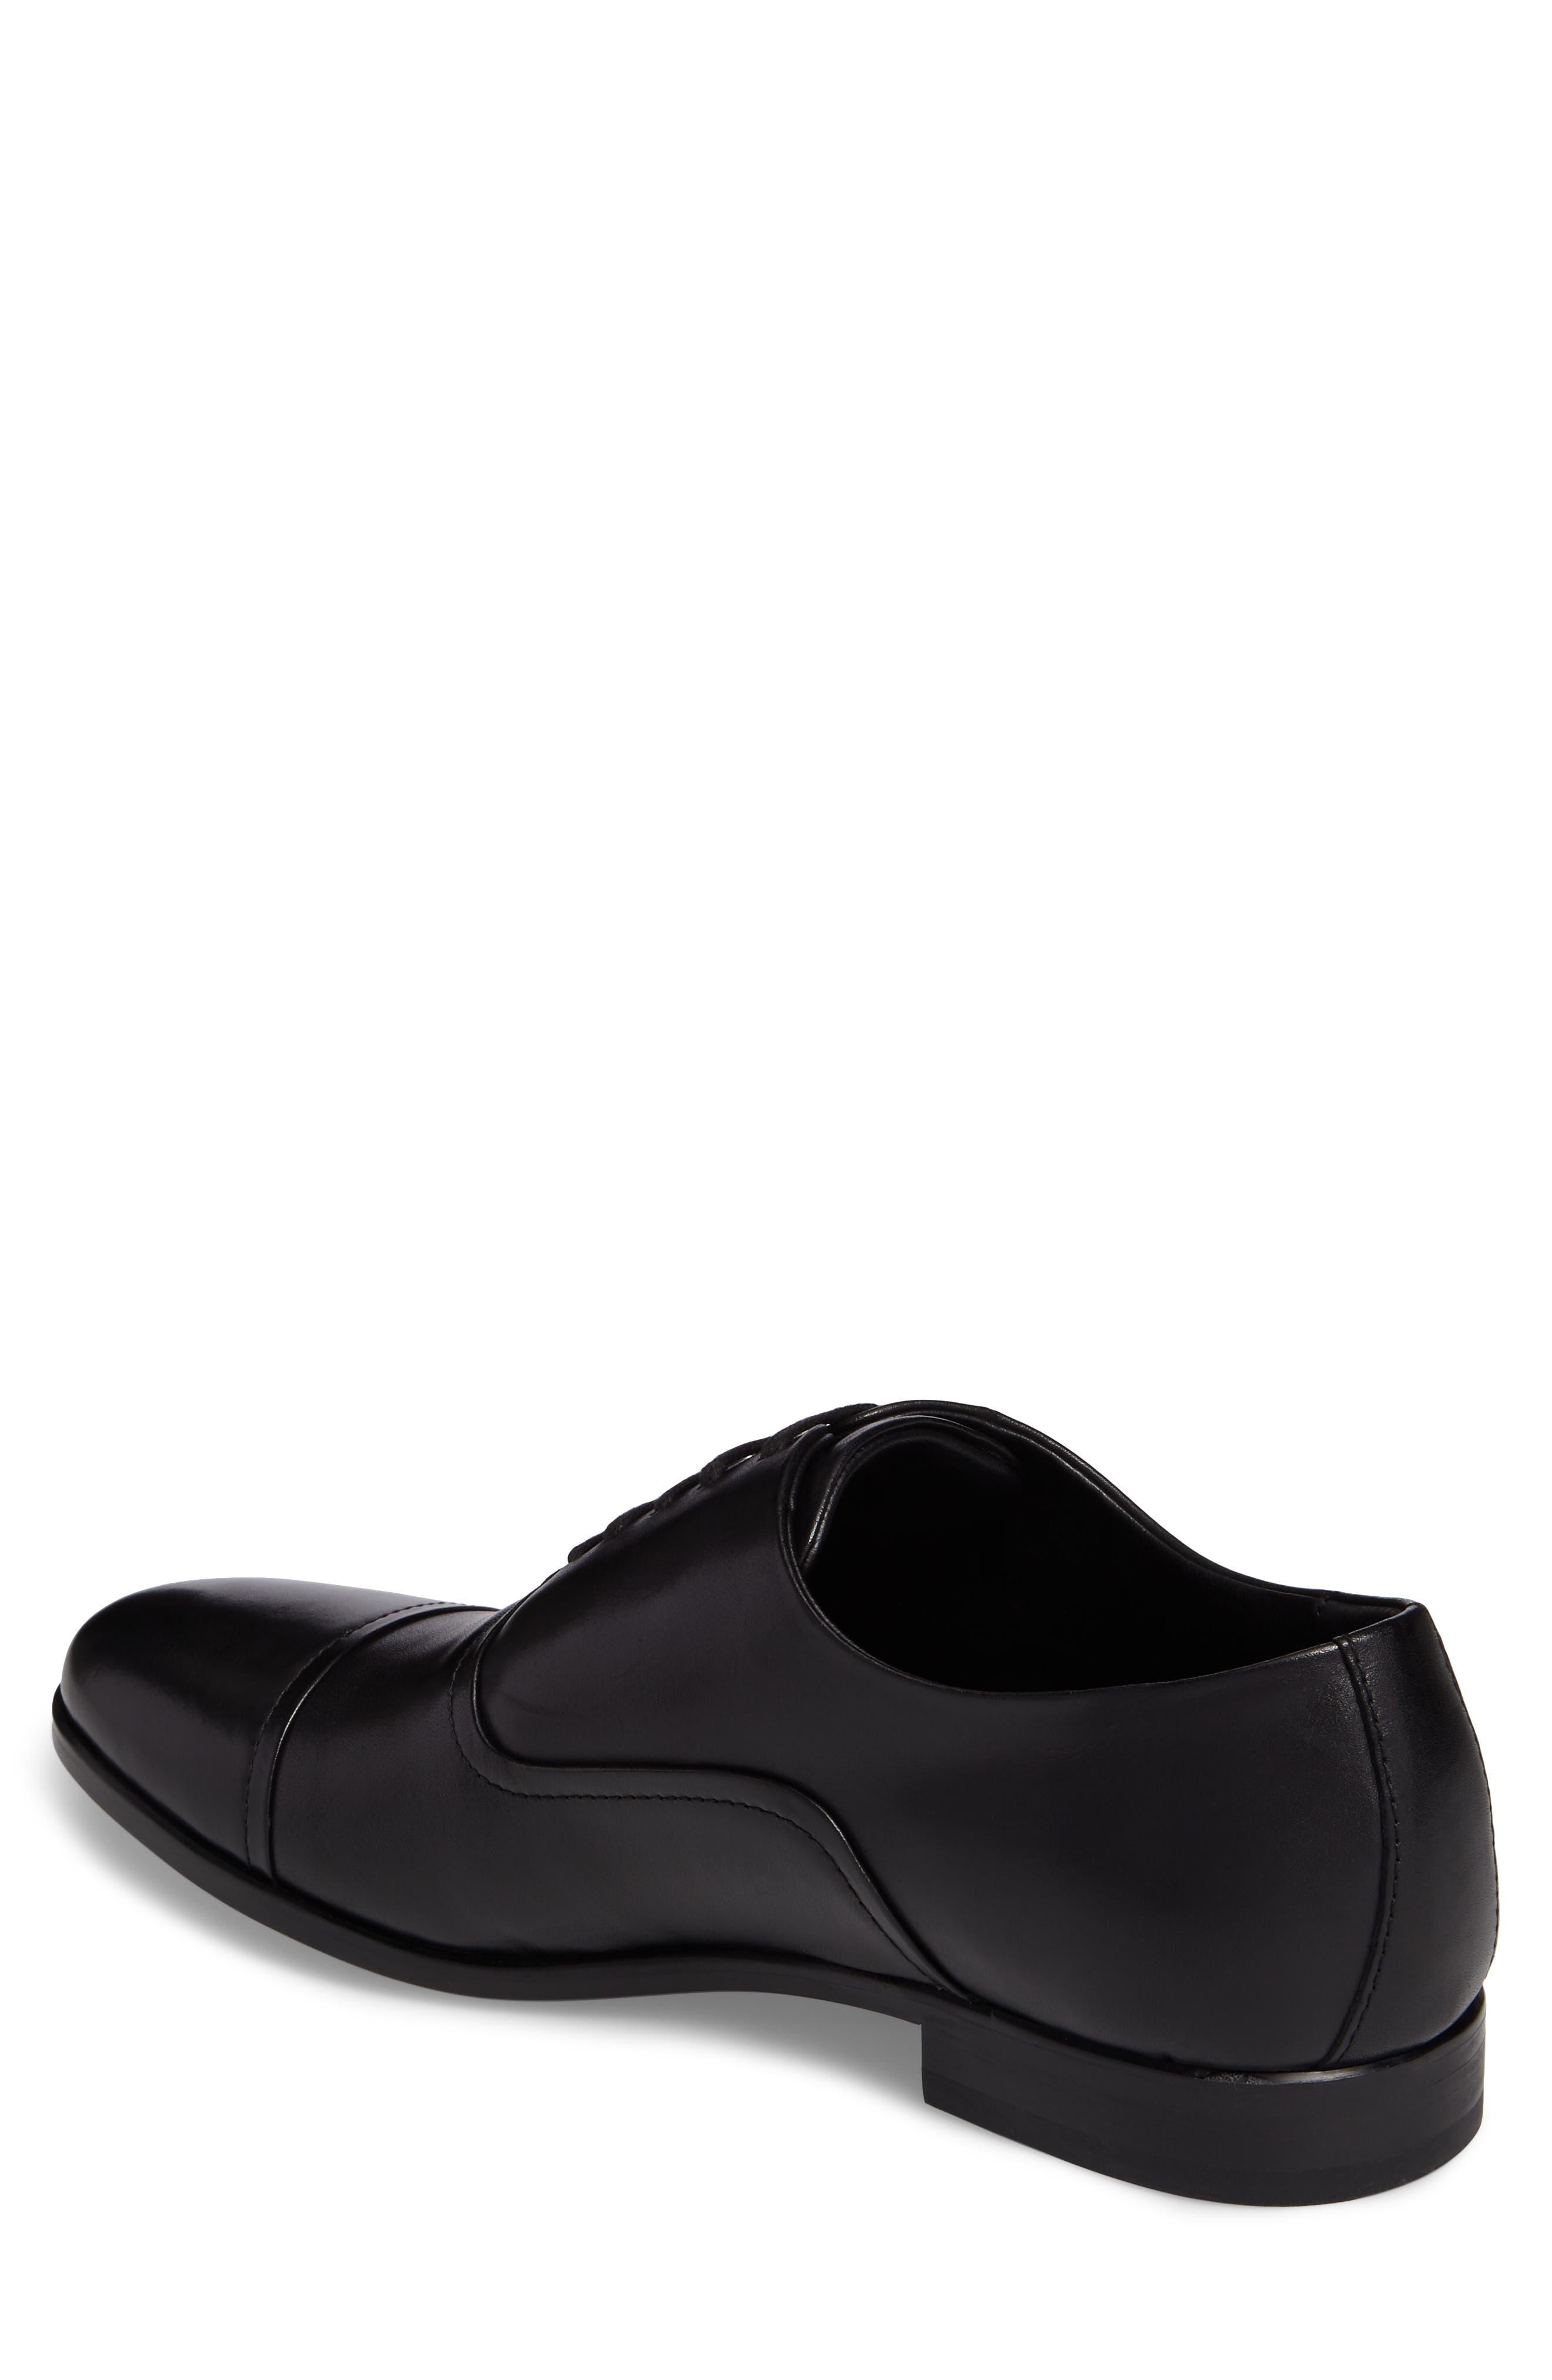 Alternate Image 2  - Calvin Klein Saul Cap Toe Oxford (Men)